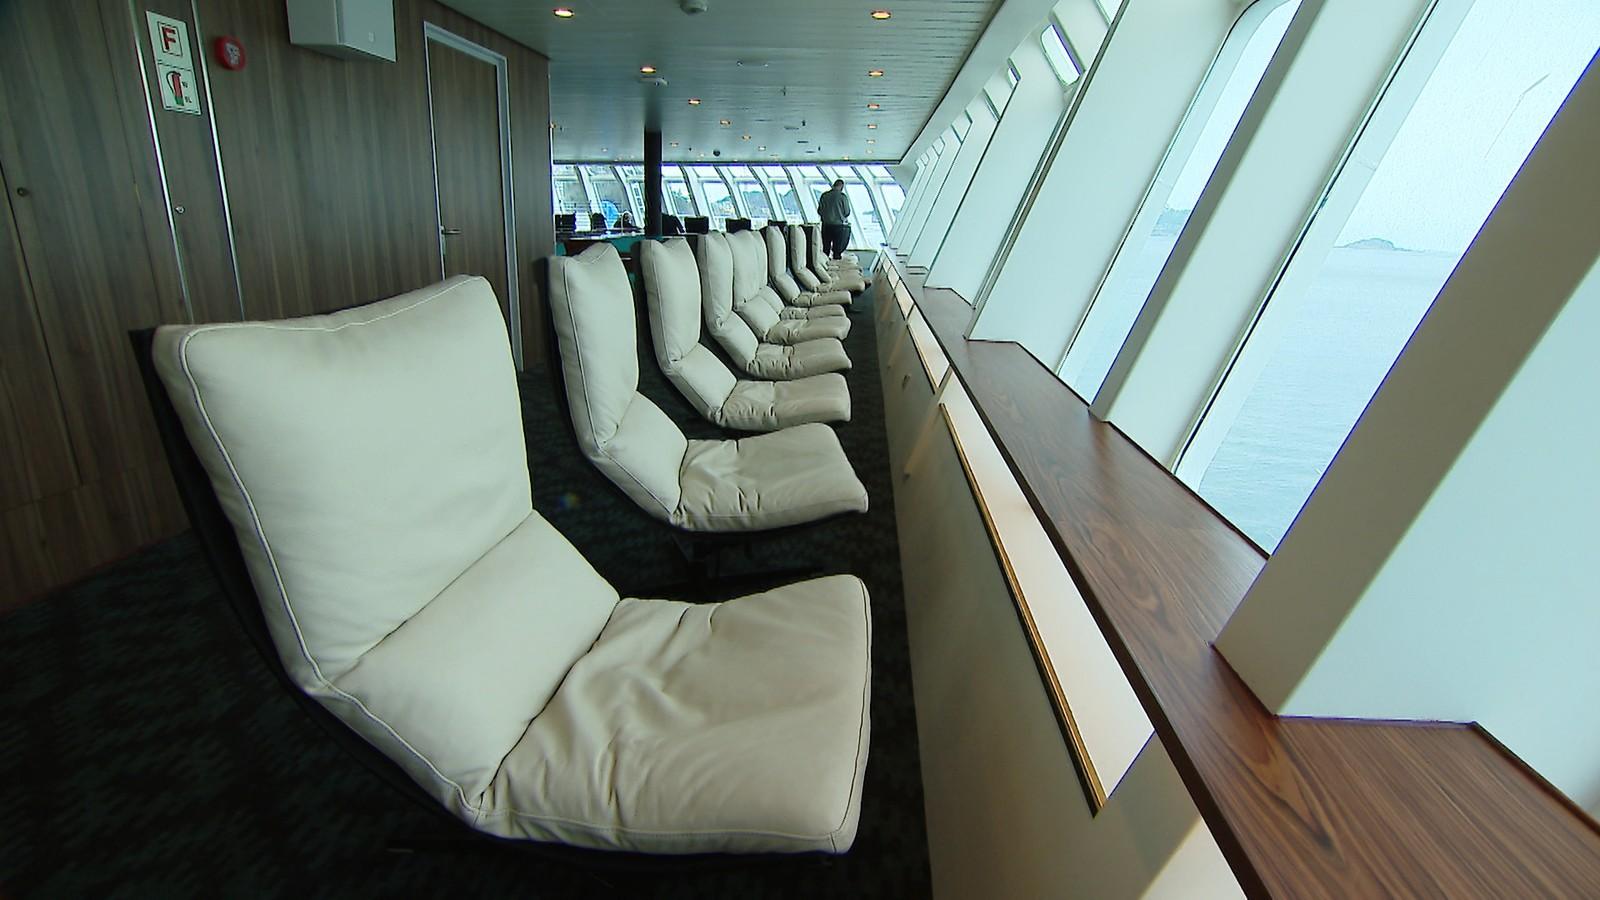 Panoramastoler i front på styrbord side.